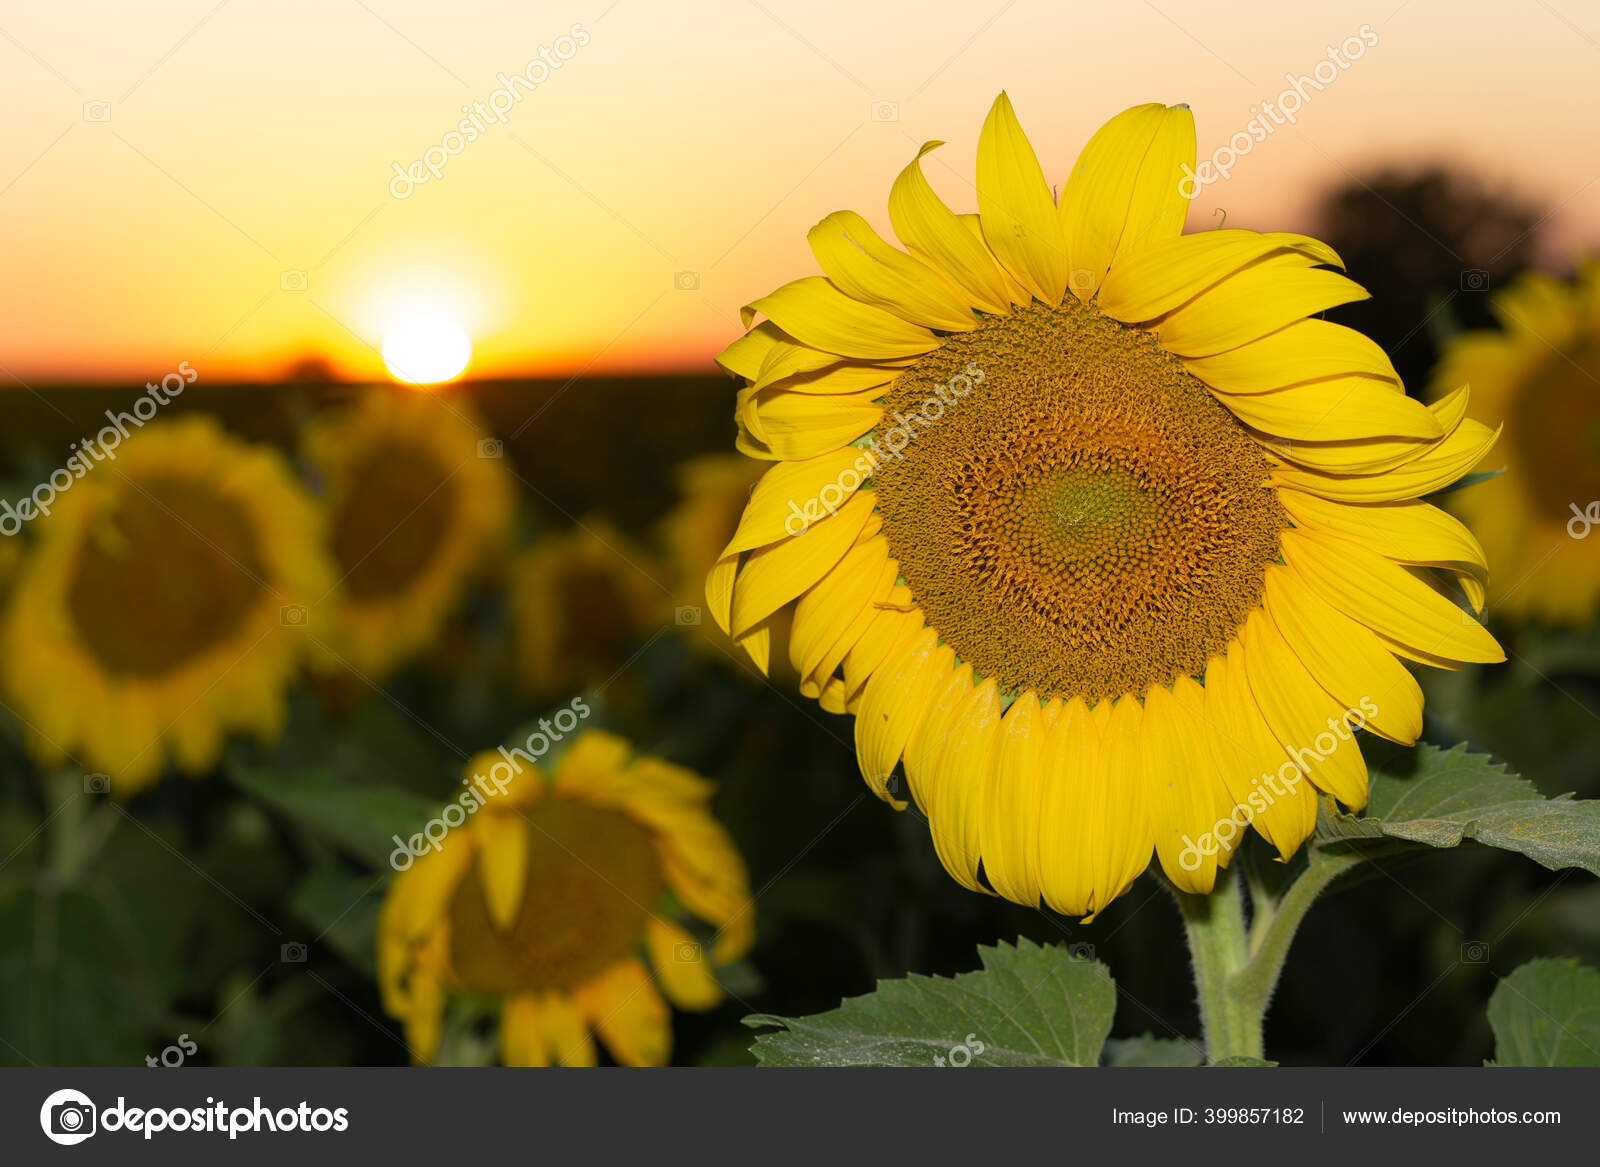 Padang Bunga Matahari Mekar Latar Belakang Matahari Terbenam Stok Foto C Piterkrig 399857182